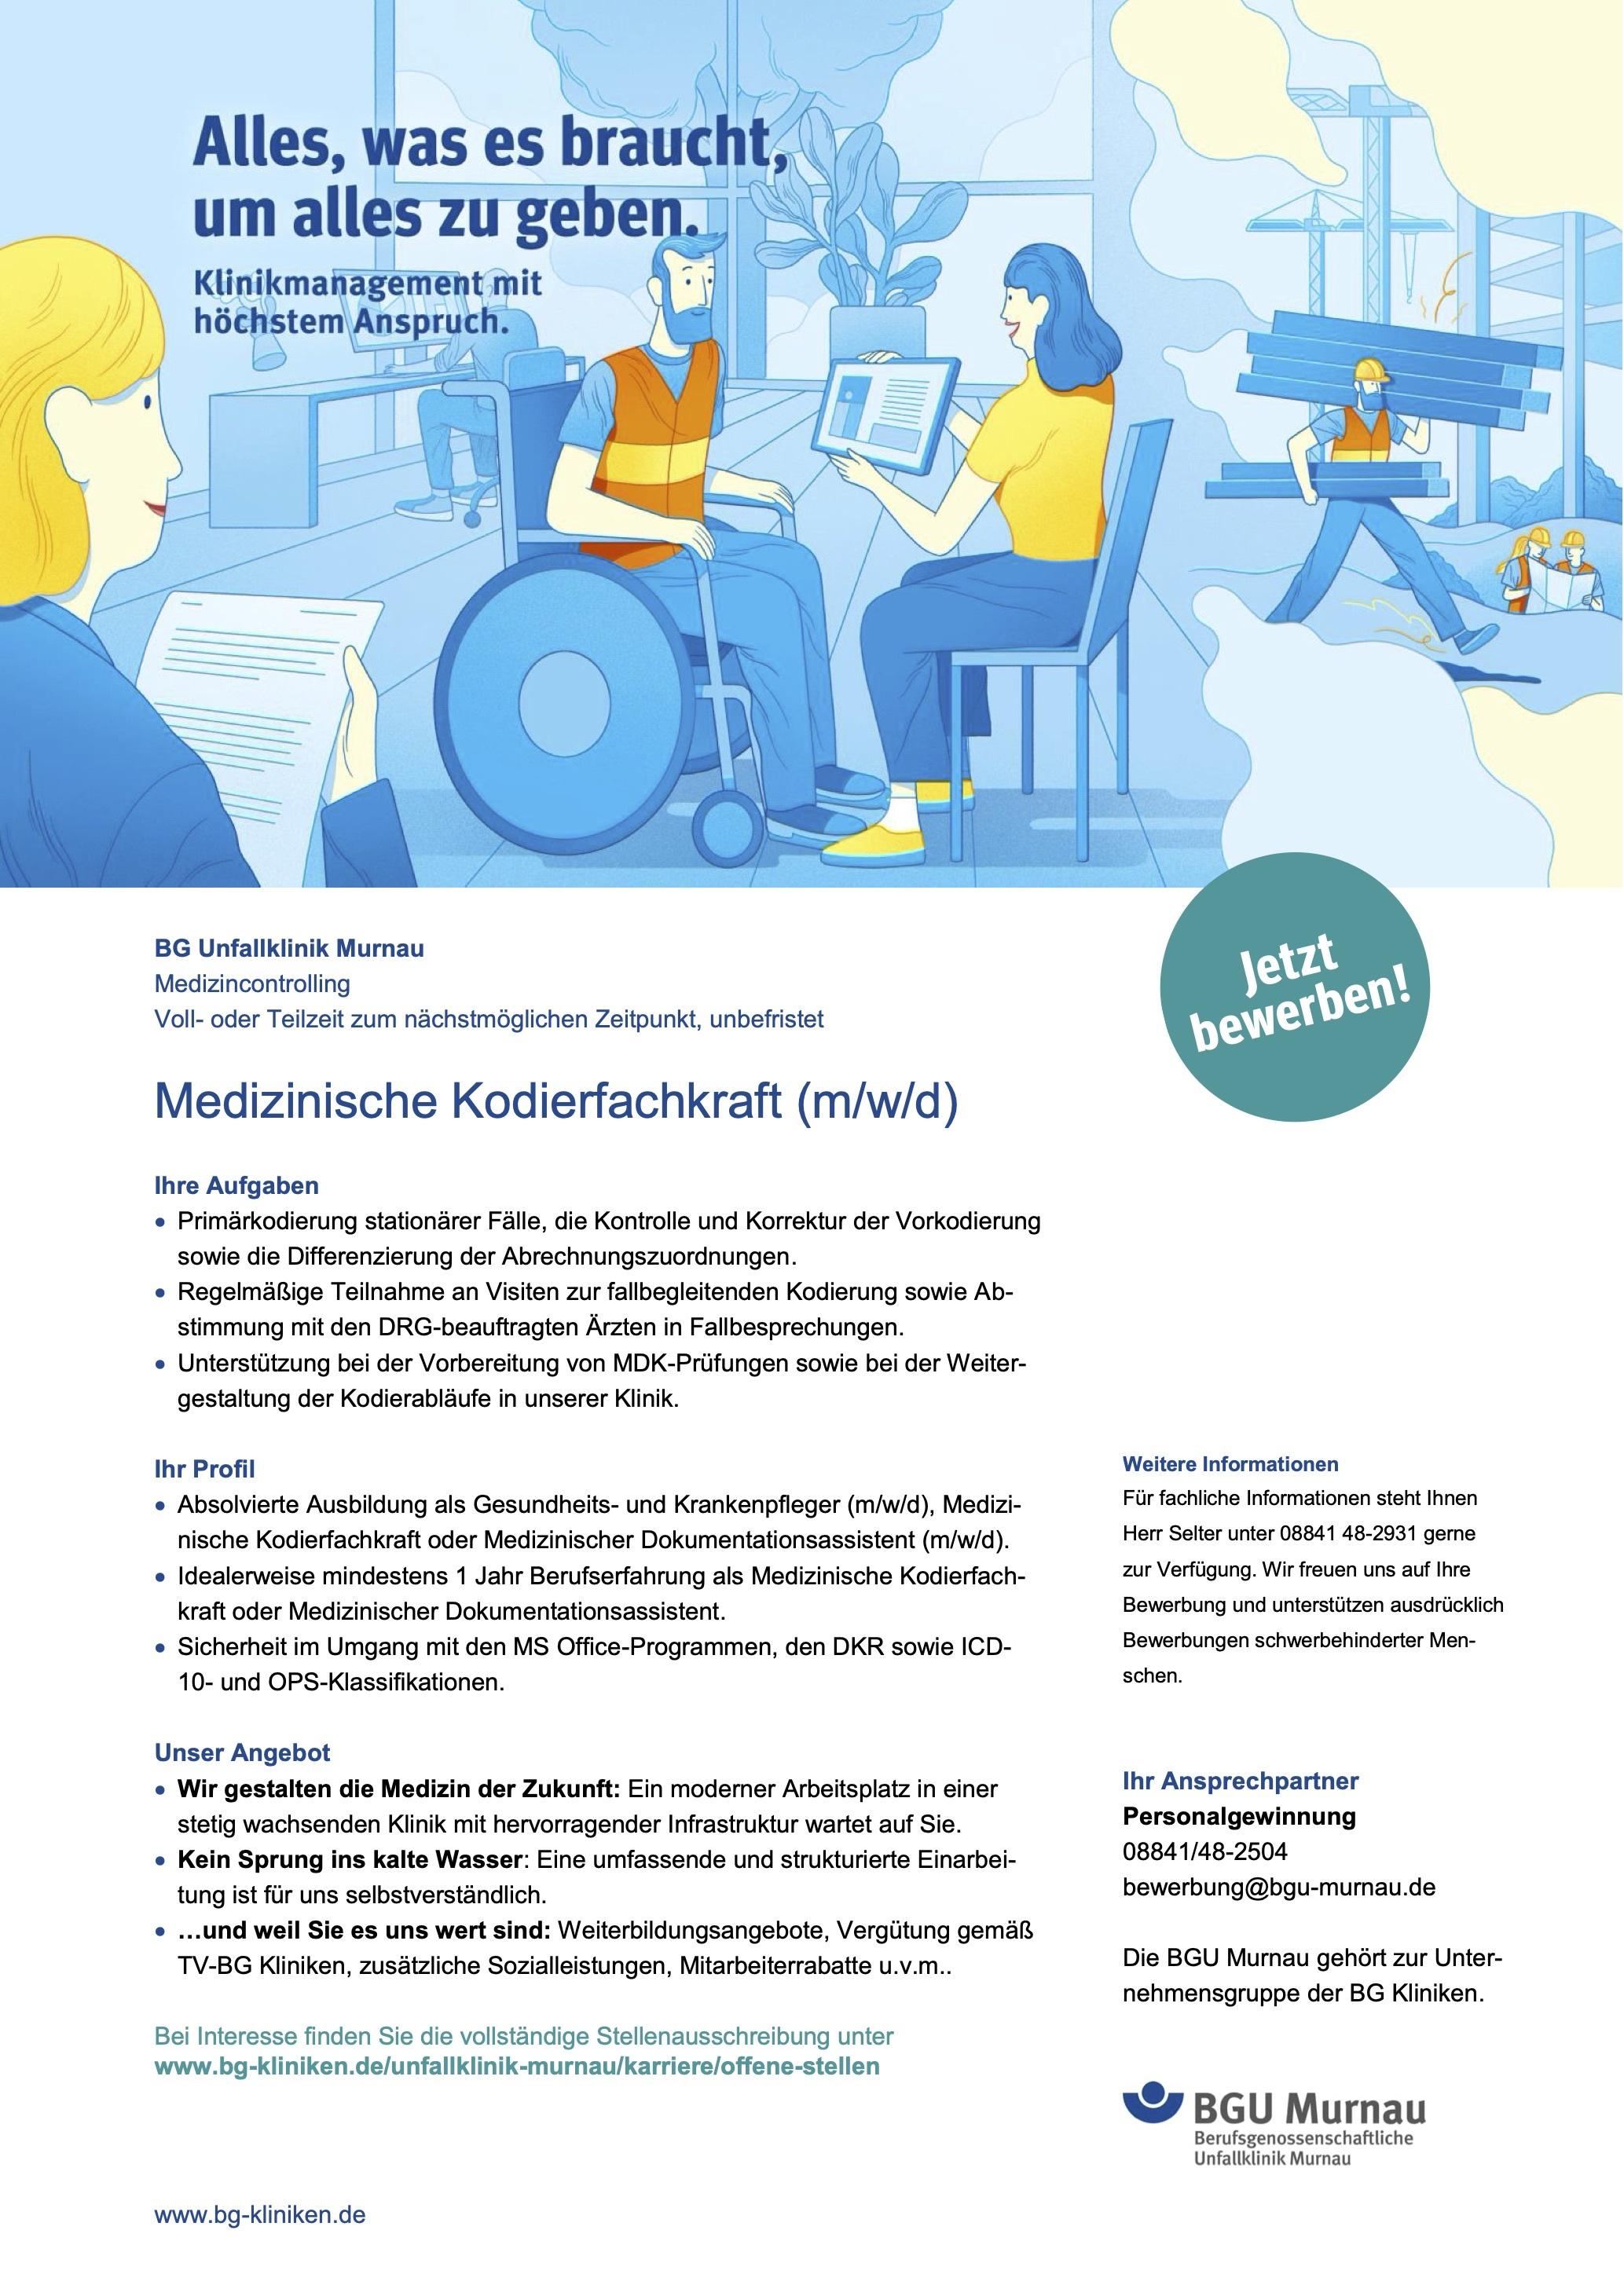 Medizinische Kodierfachkraft (m/w/d)